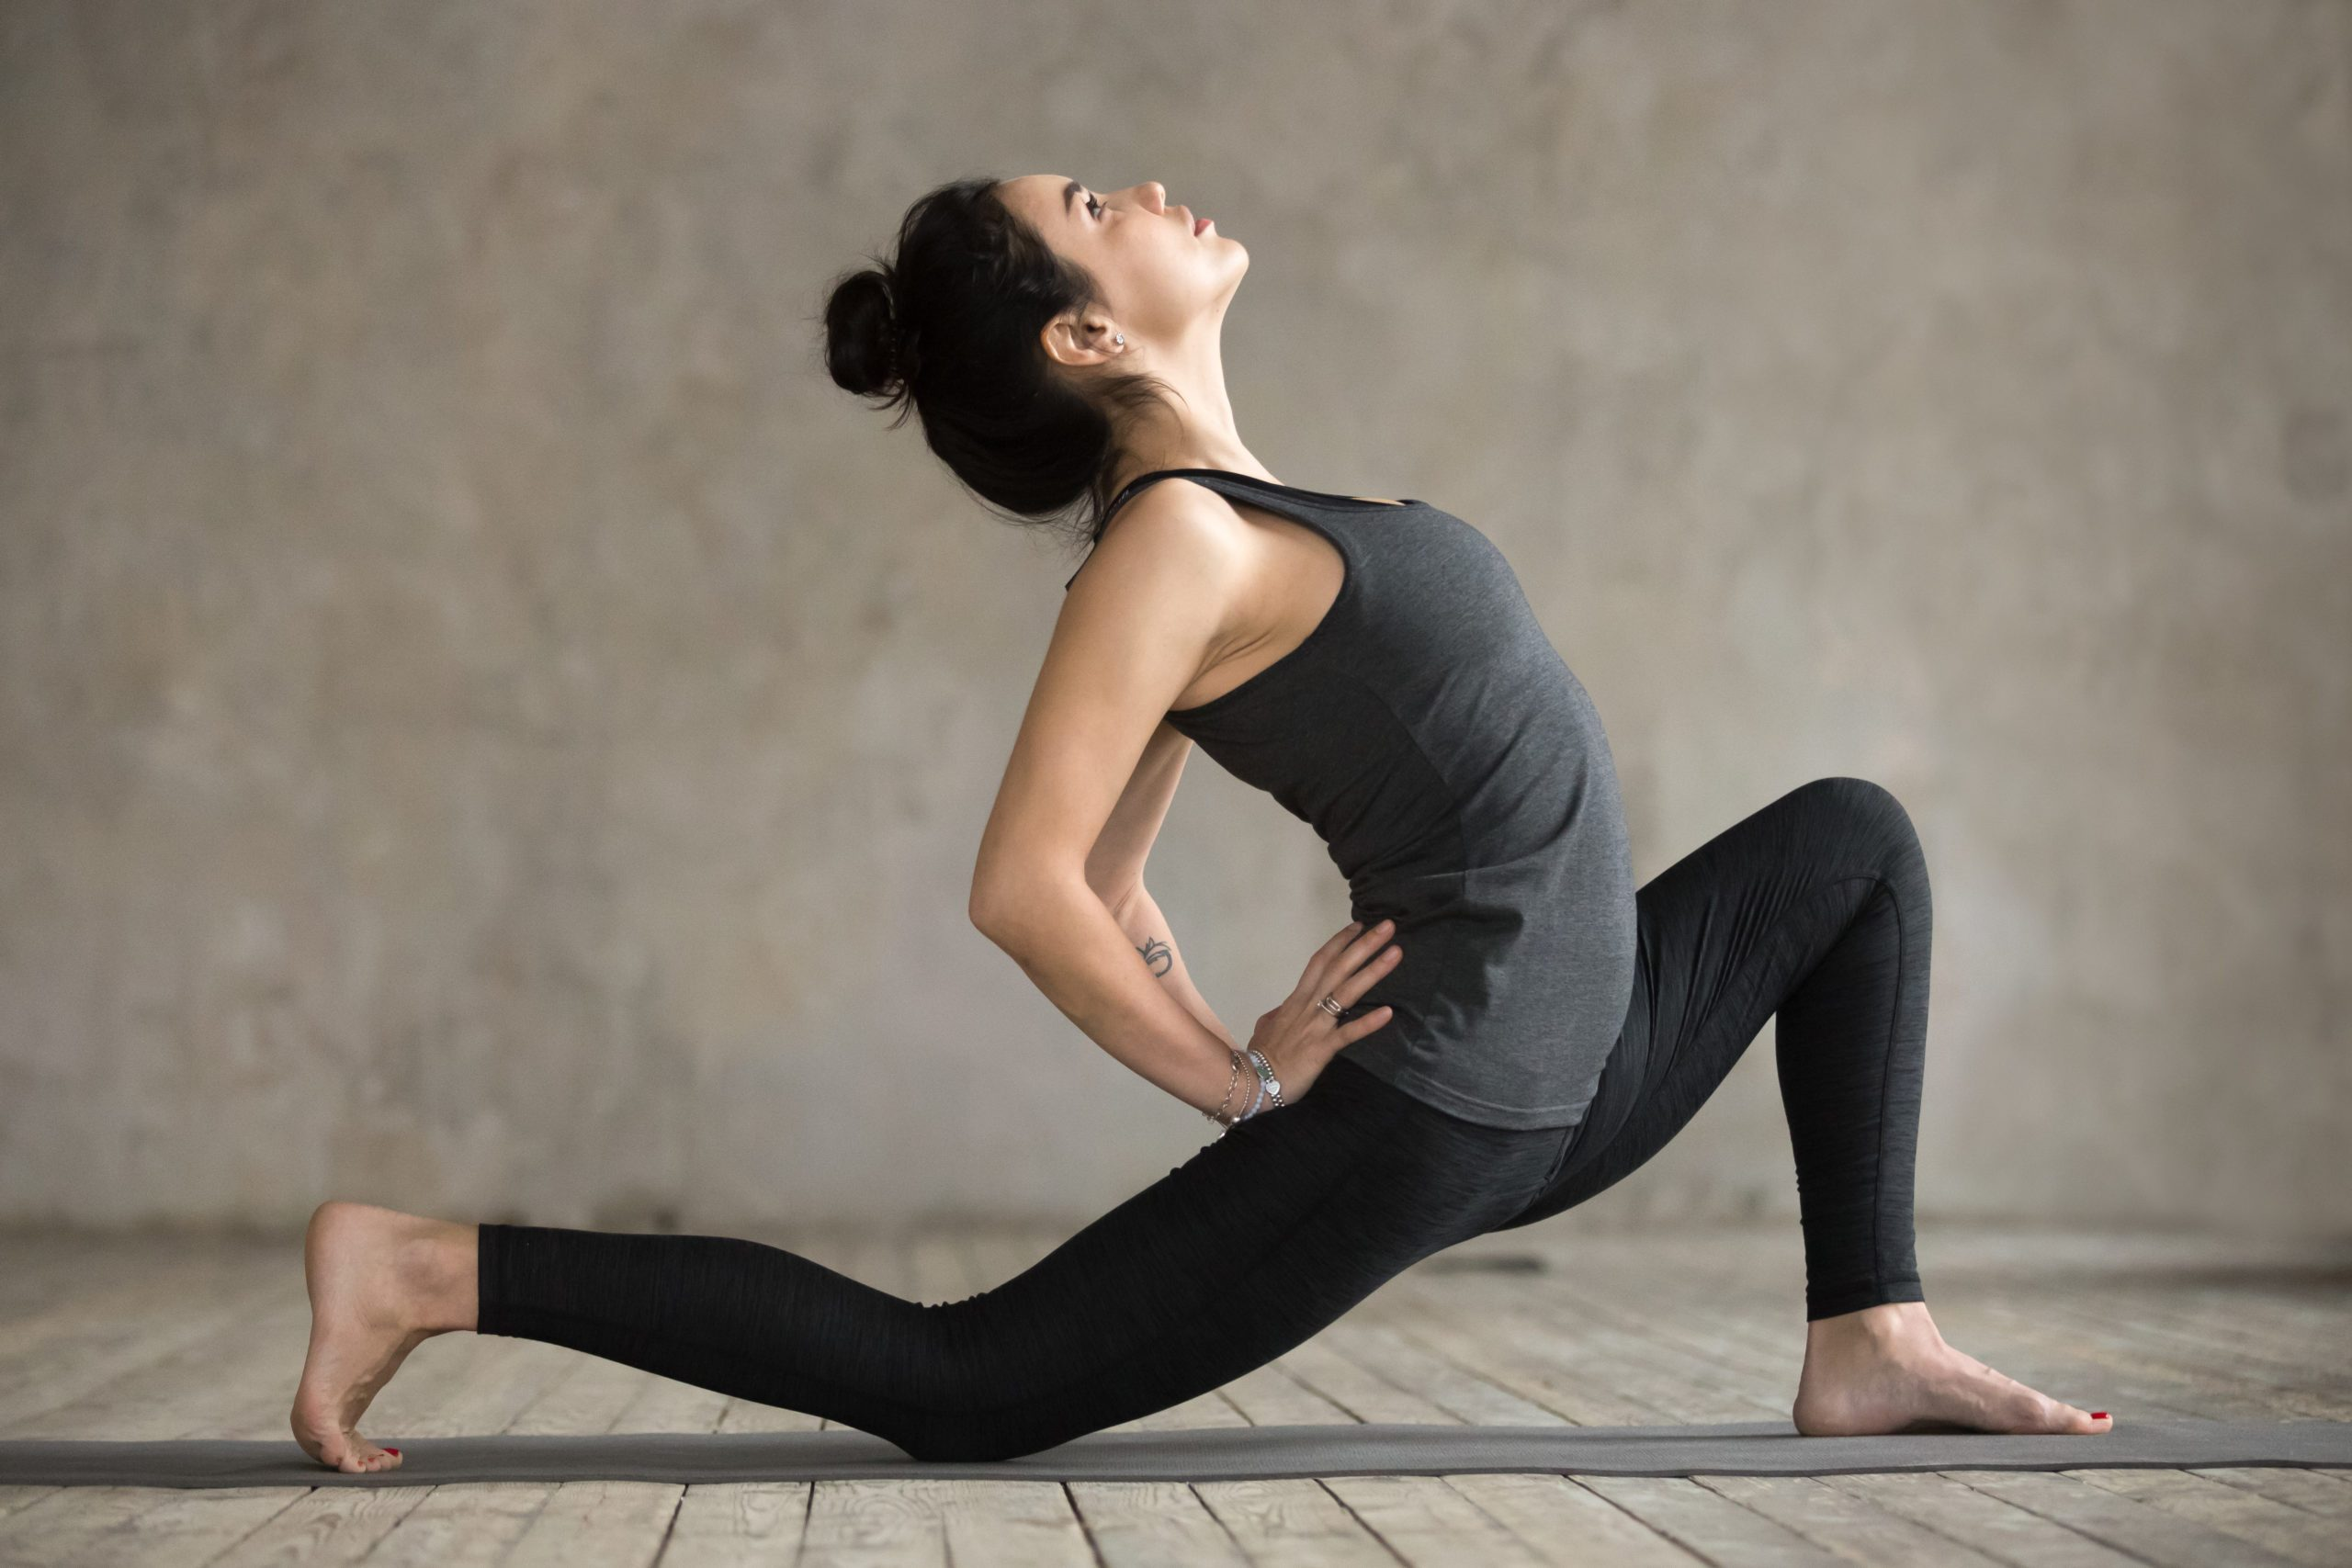 Top 5 Exercises For Leg Flexibility